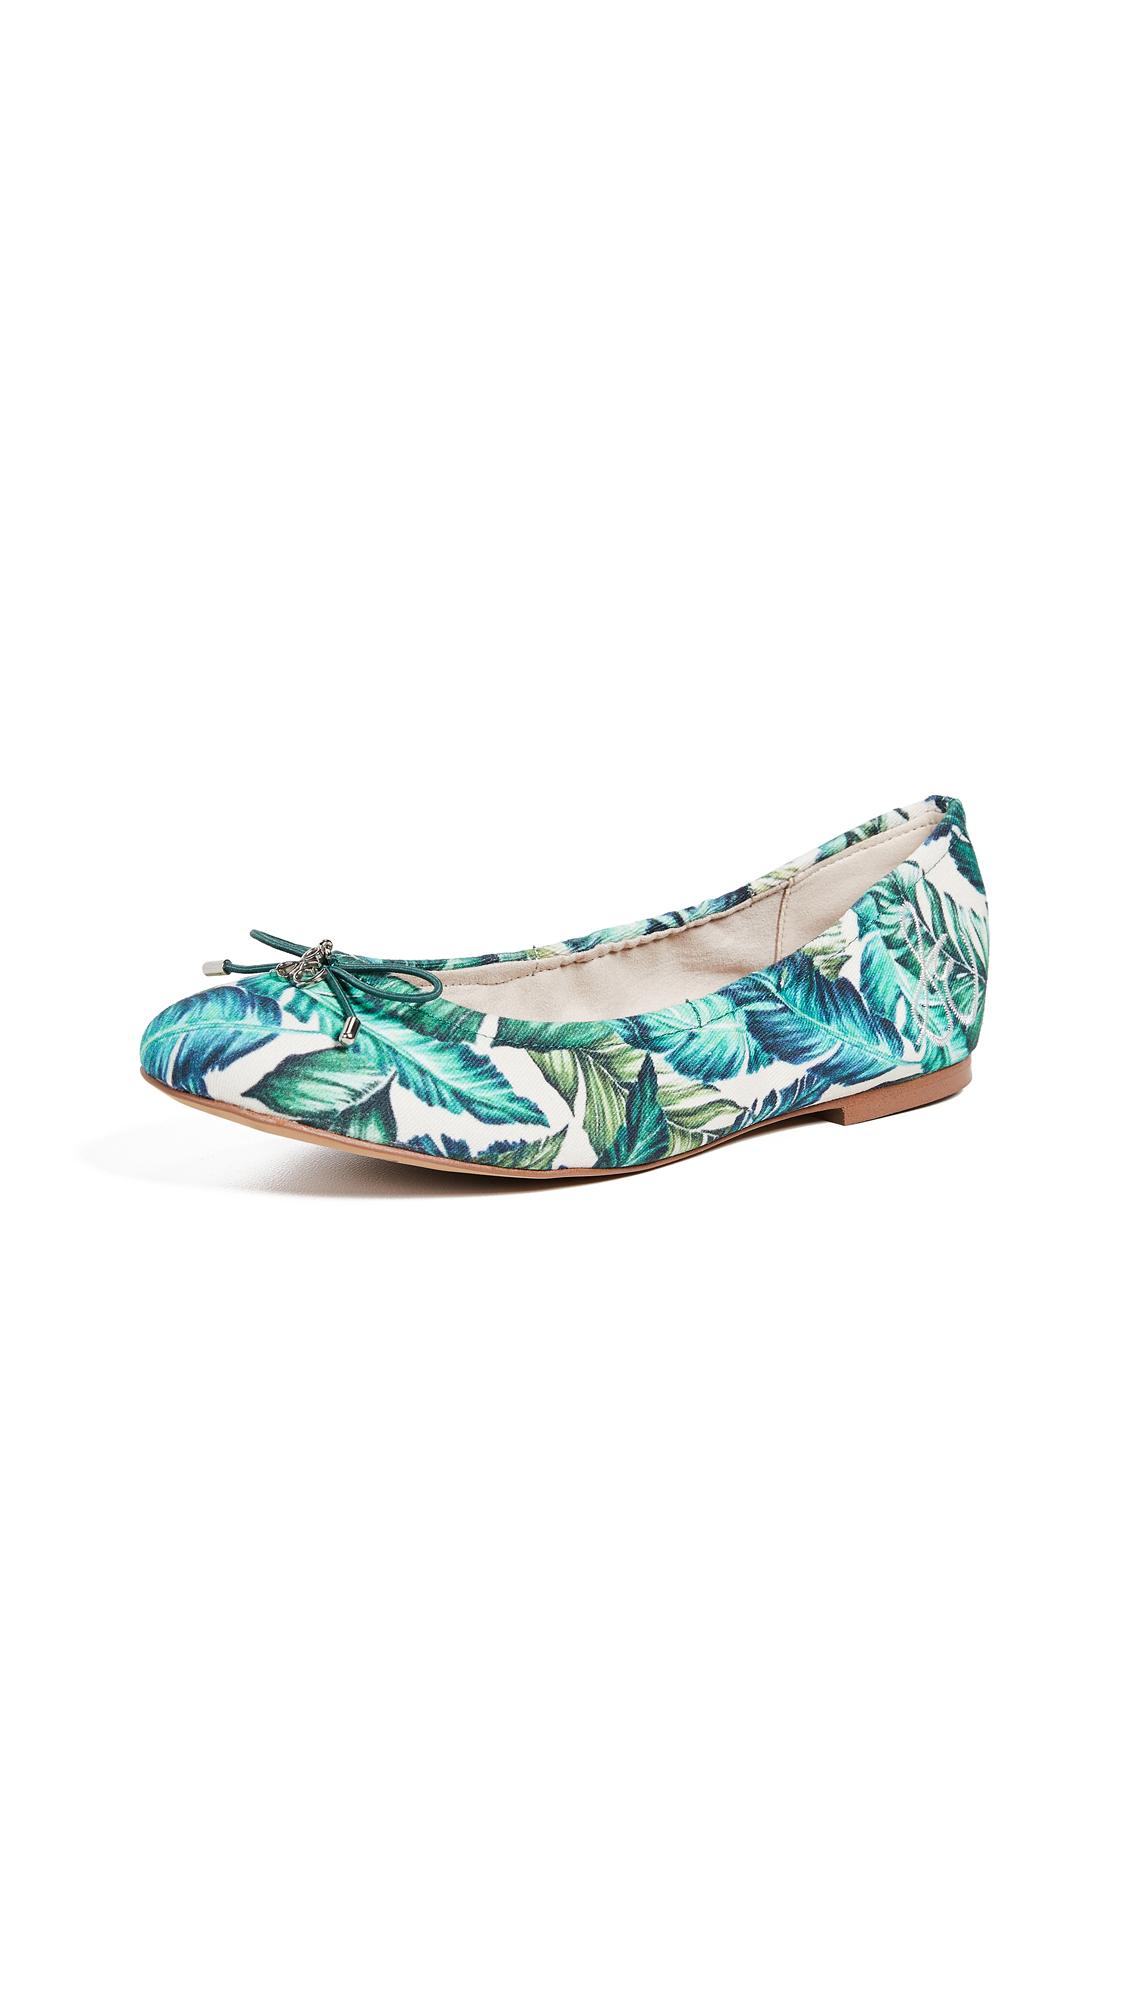 Sam Edelman Felicia Ballet Flats - Jade Multi